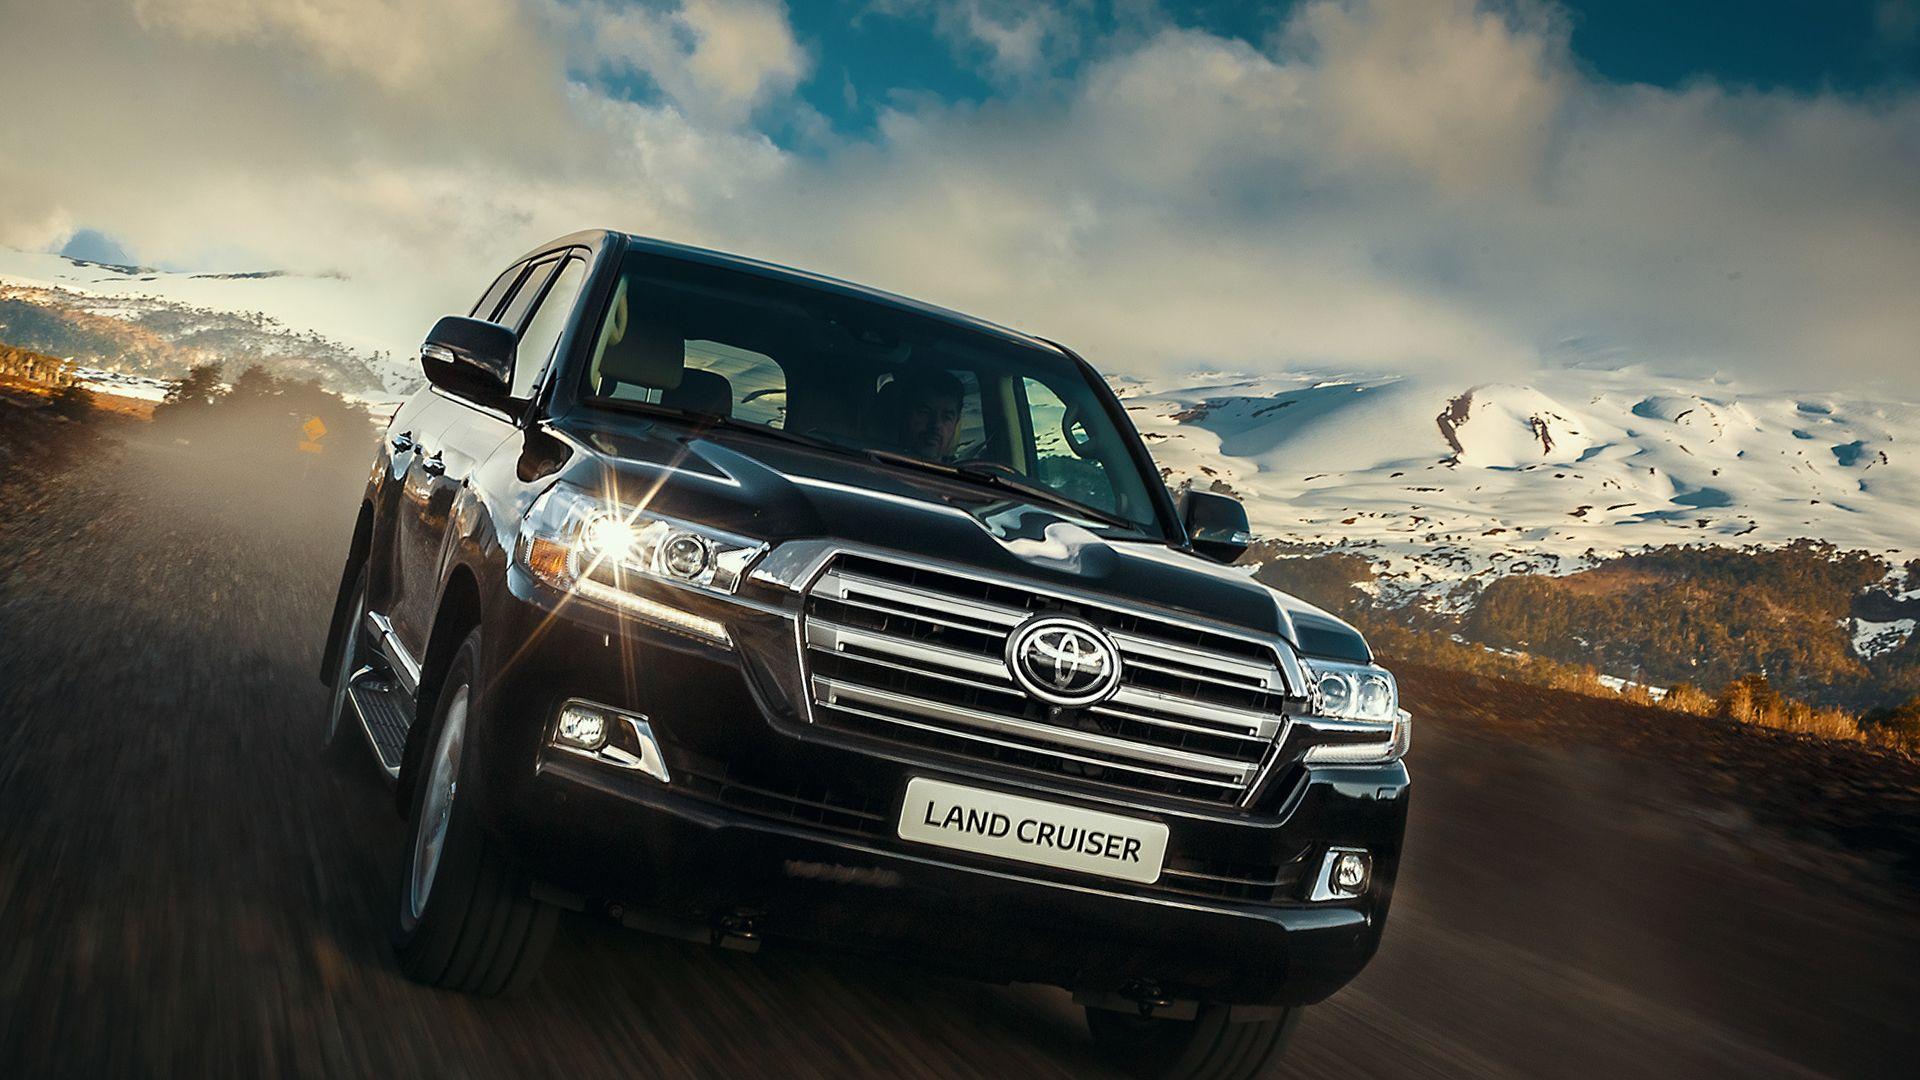 New 2019 Toyota Land Cruiser 200 Exterior Changes Toyota Land